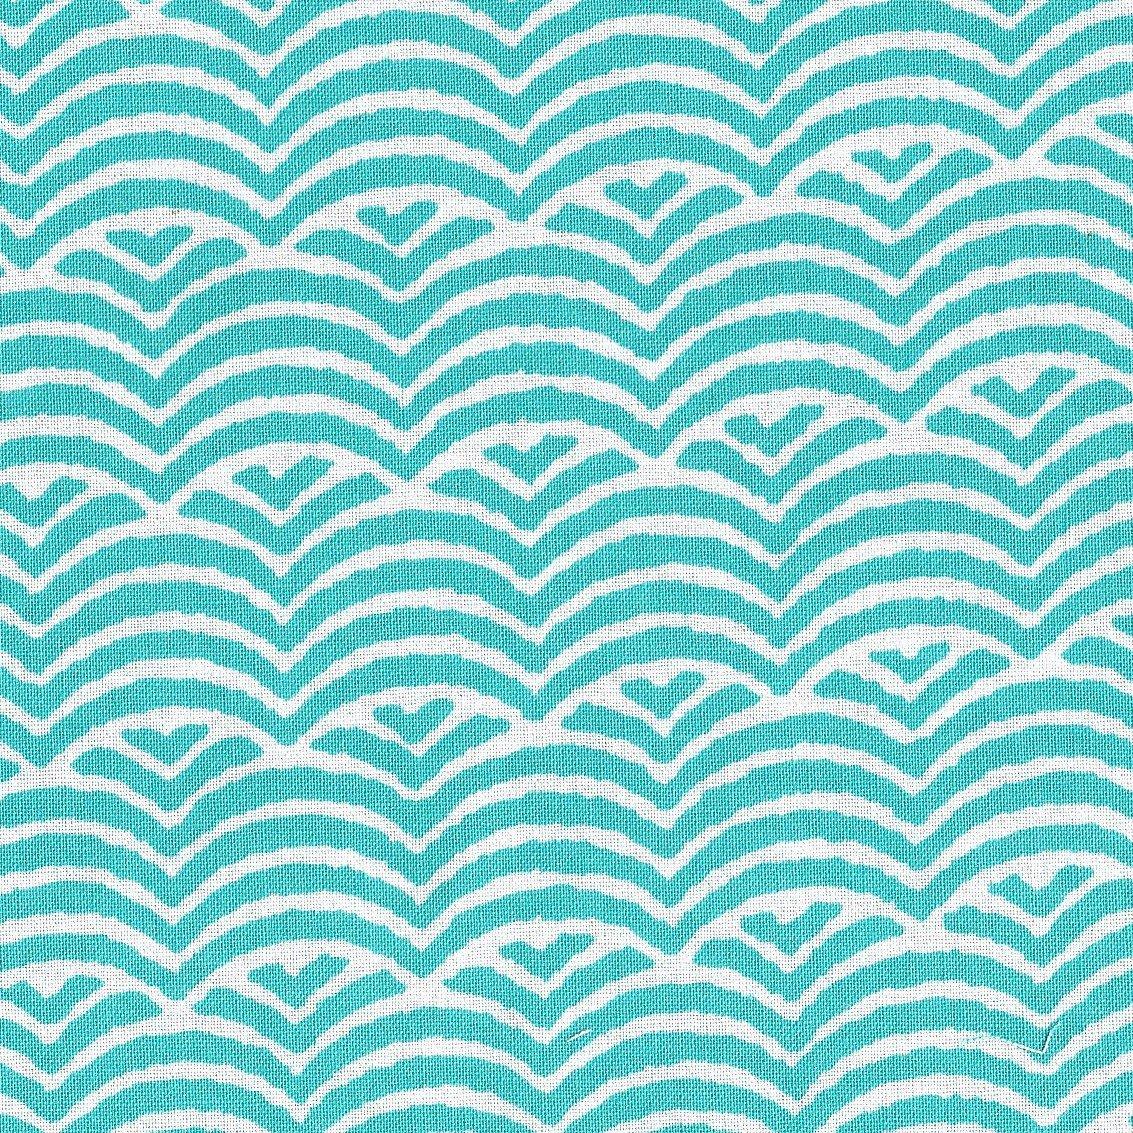 Umbrella Prints Elephants Love Water - Waves in Bakelite Blue